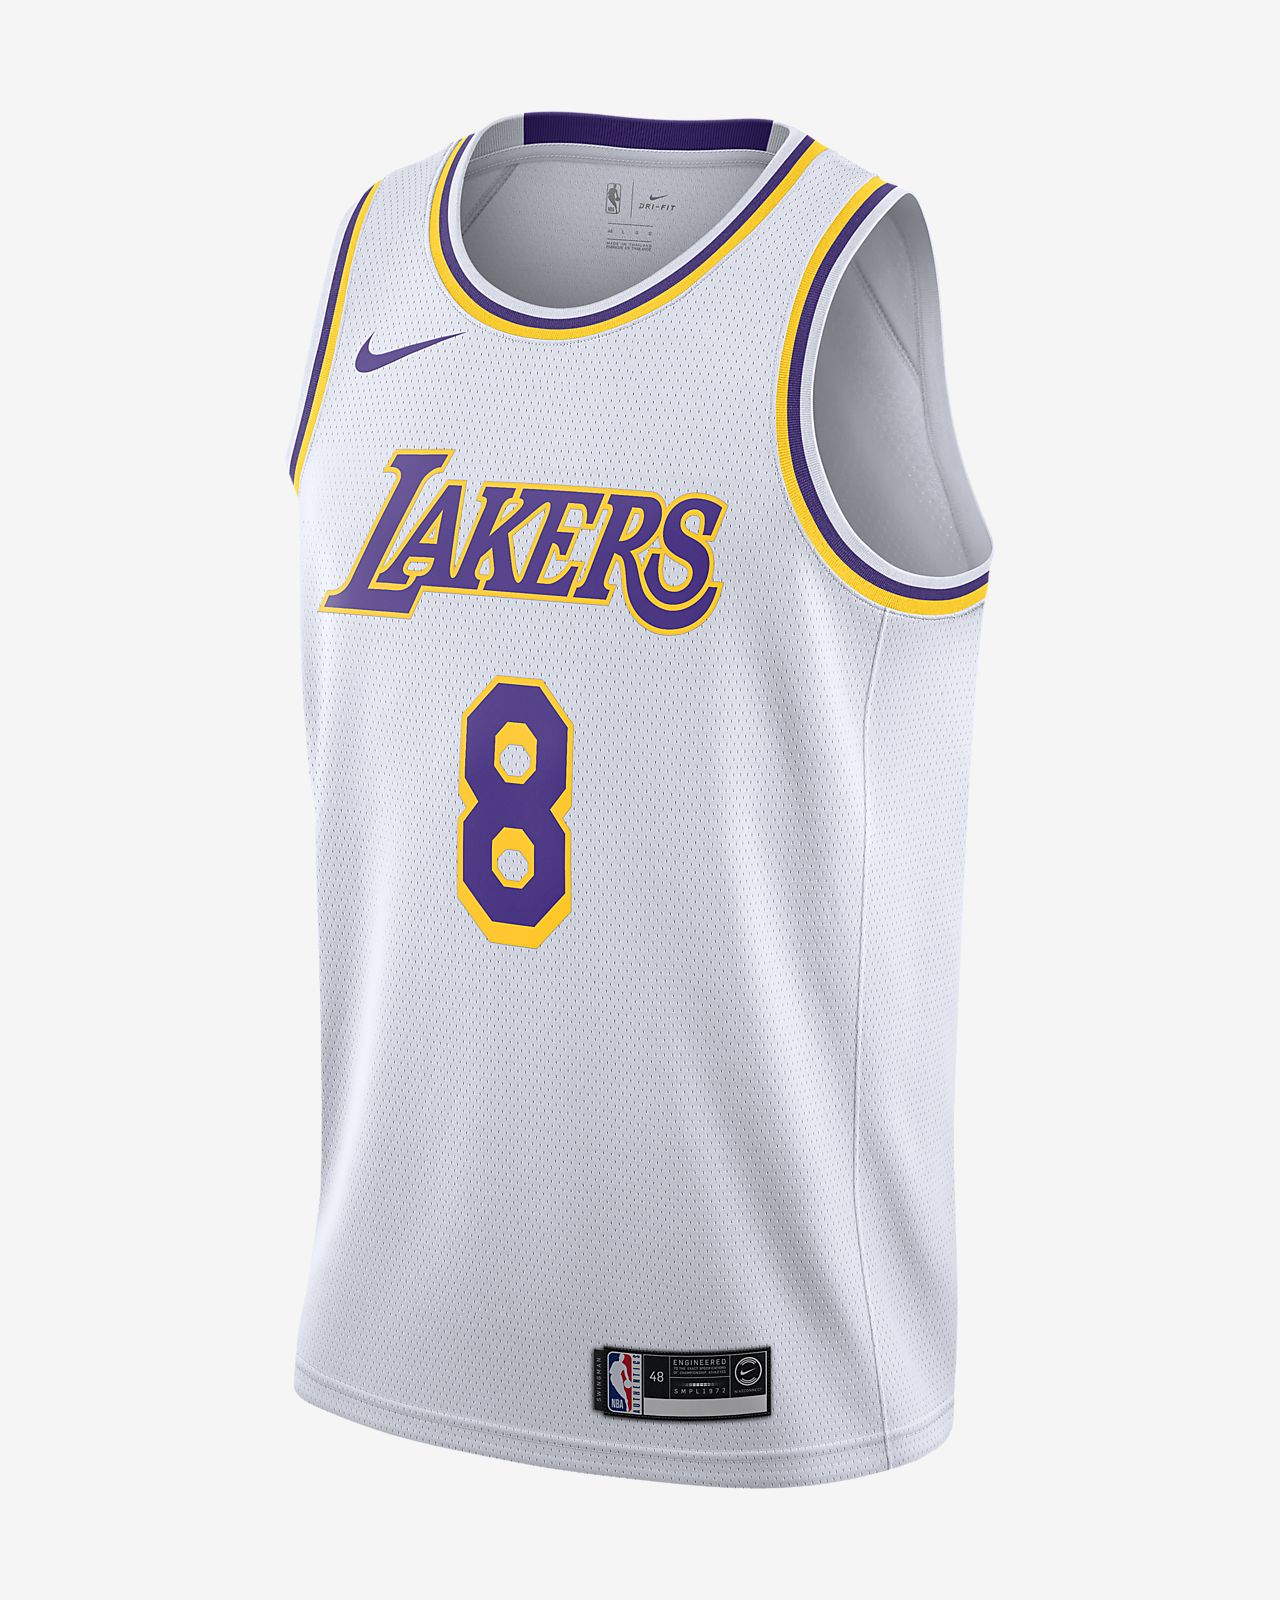 Dres Nike NBA Swingman Kobe Bryant Lakers Association Edition